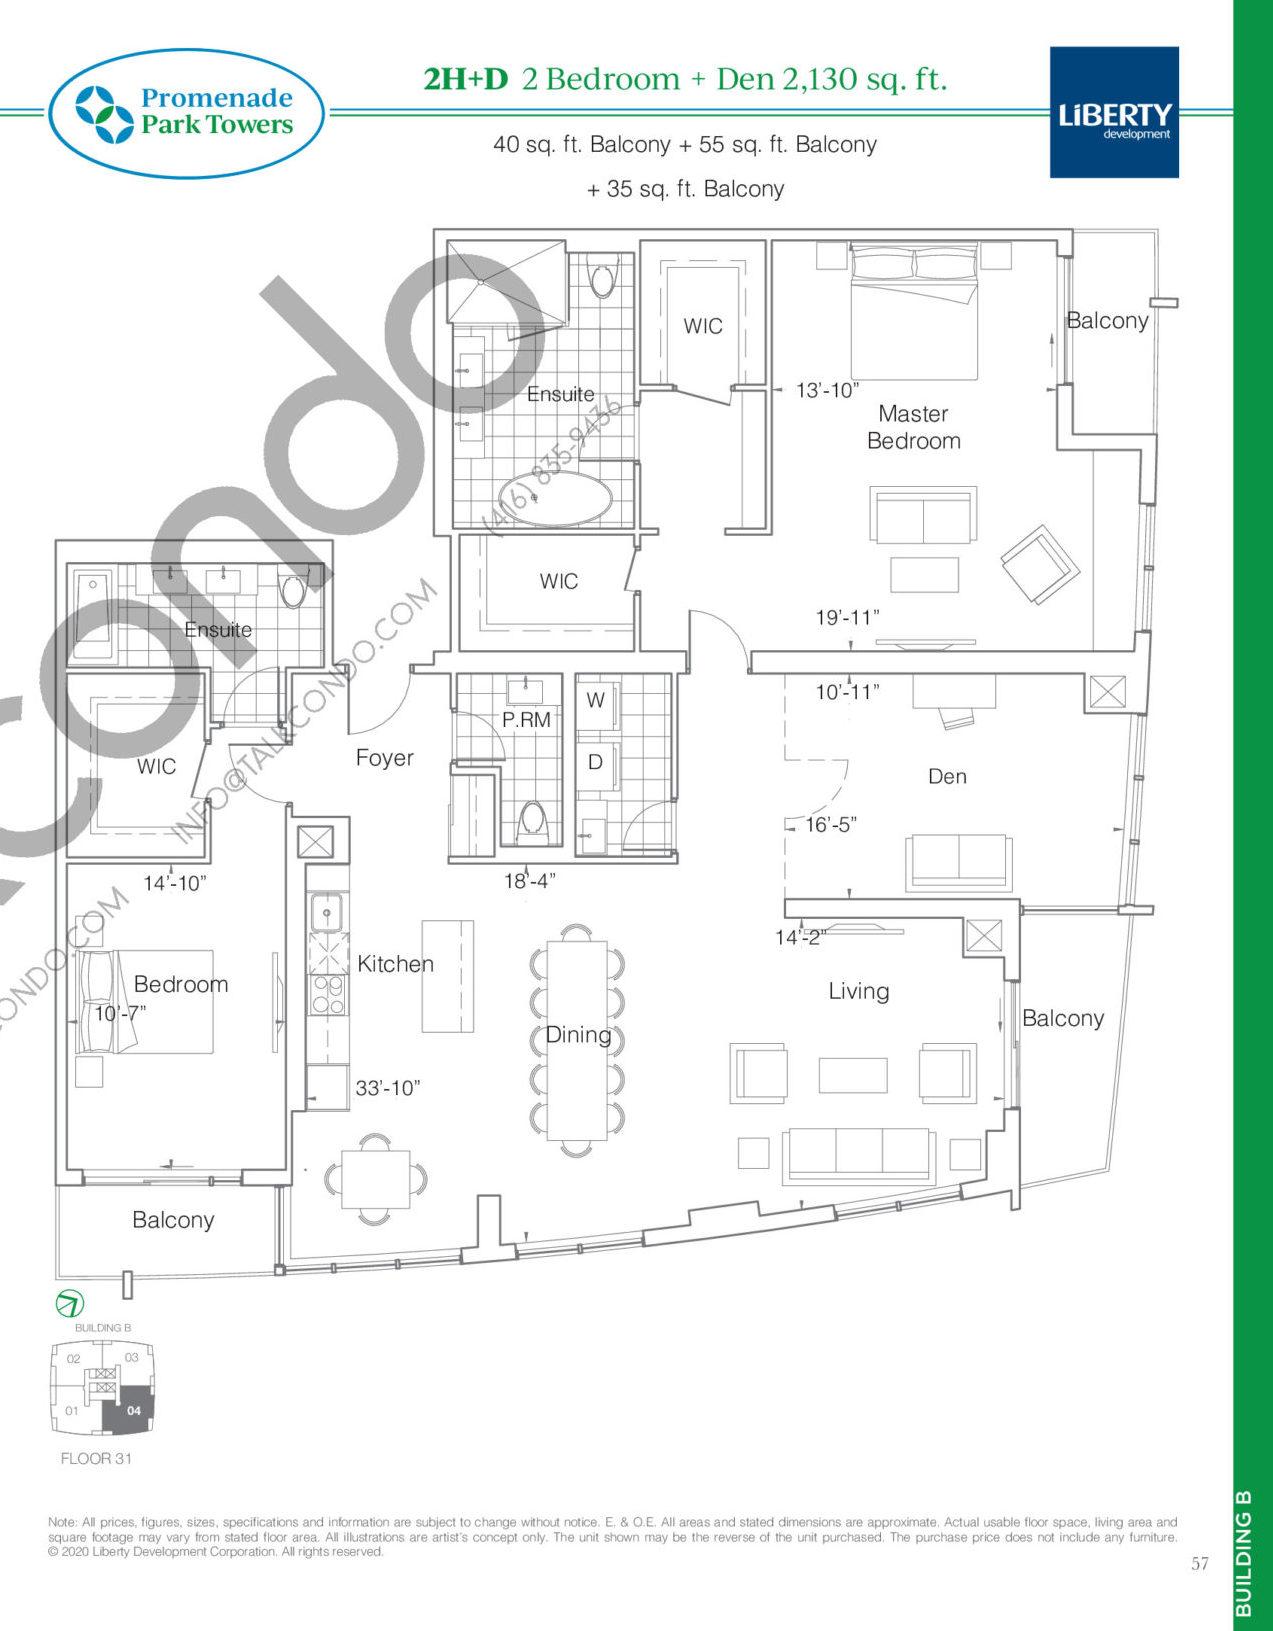 2H+D Floor Plan at Promenade Park Towers Phase 2 Condos - 2130 sq.ft